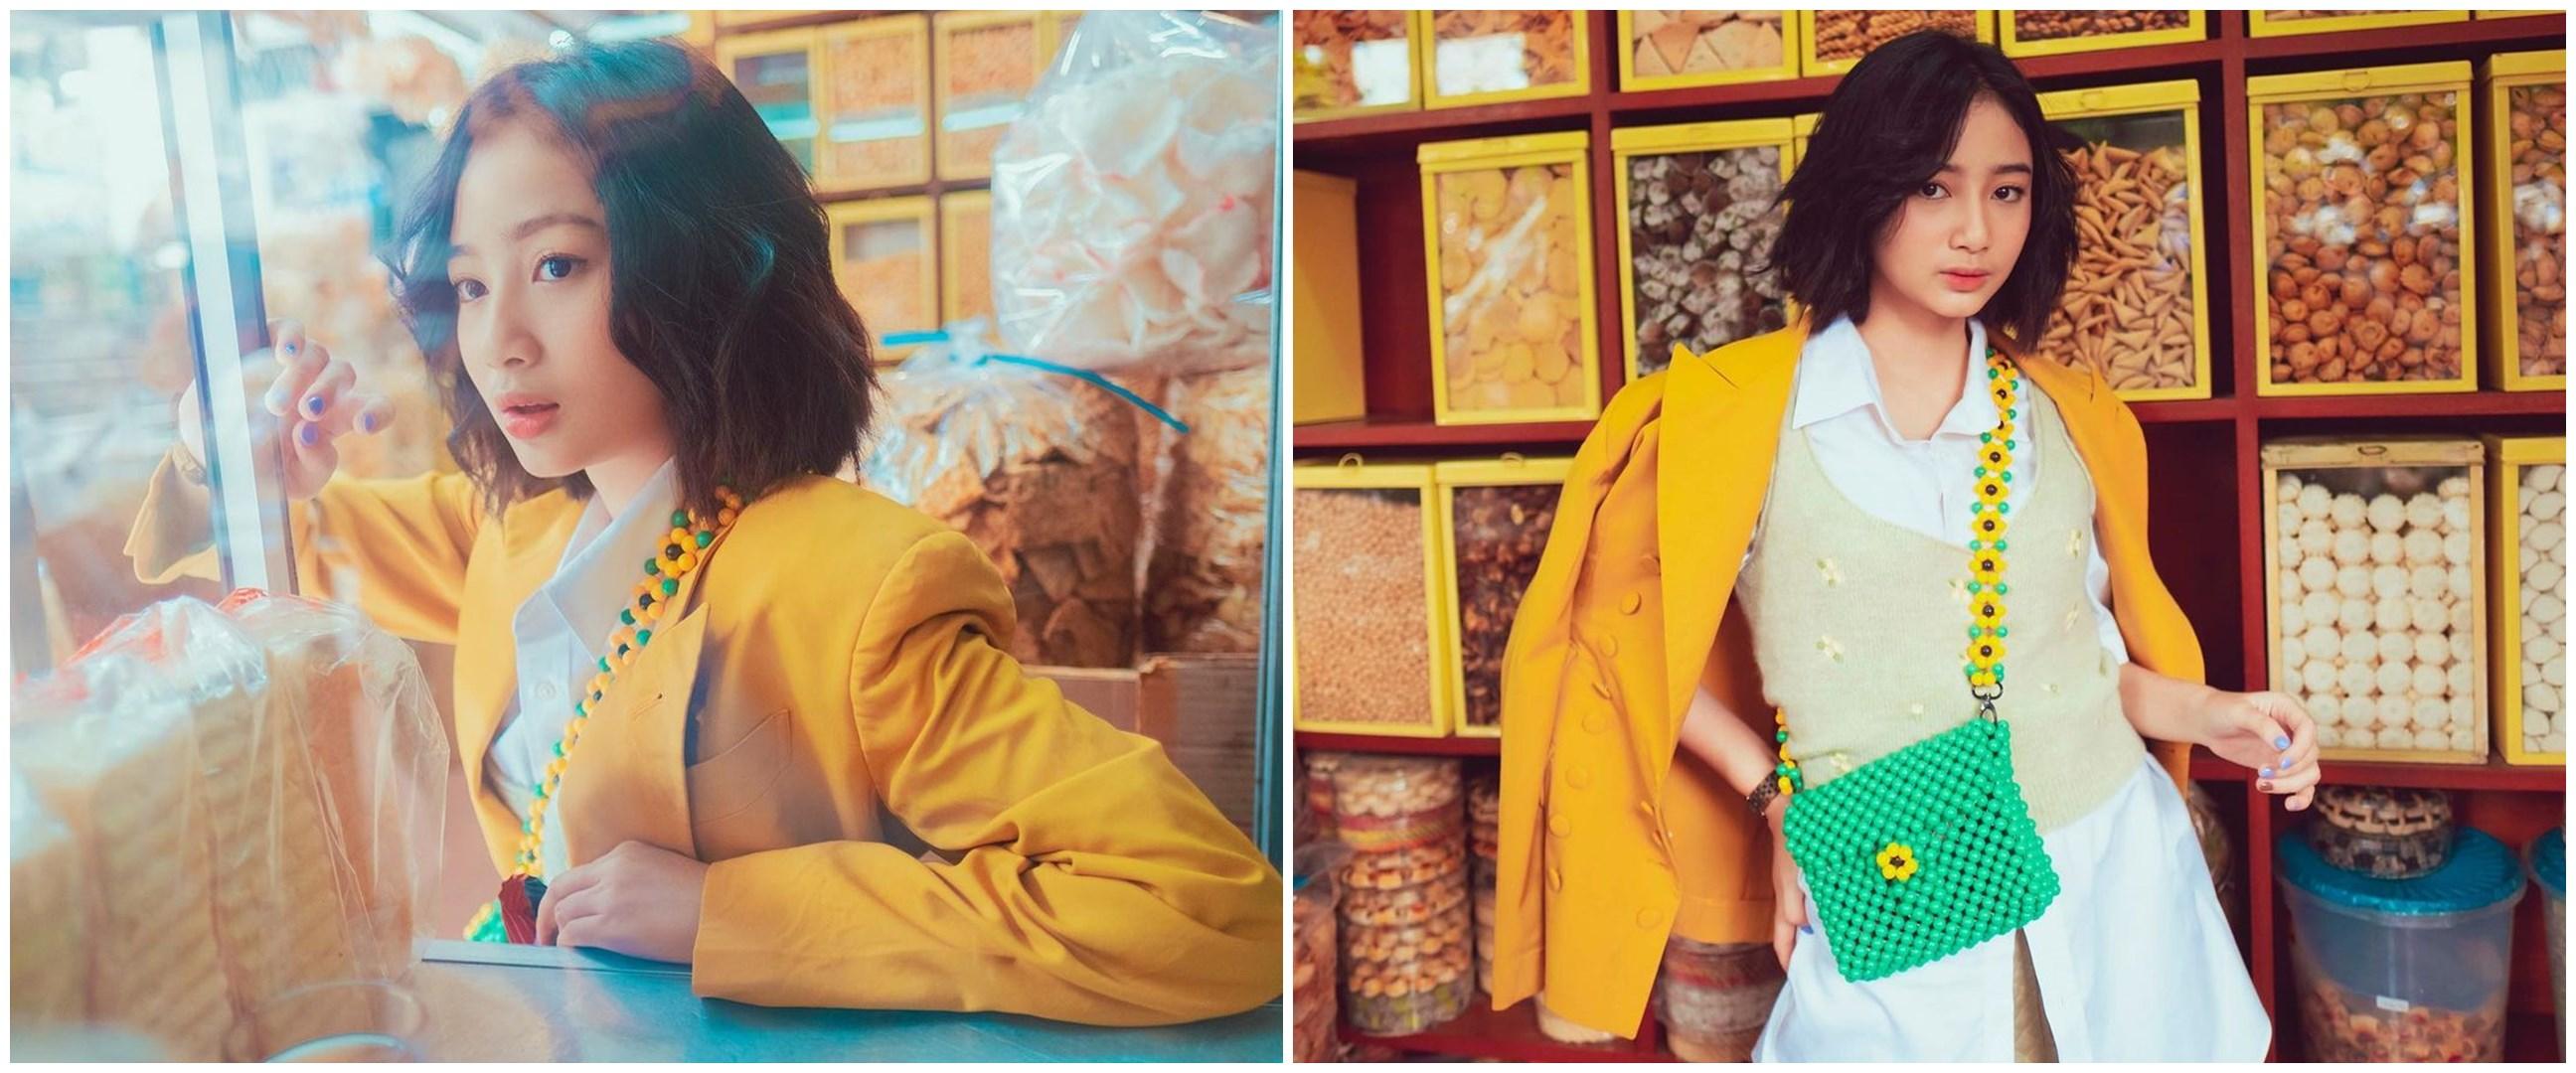 10 Pemotretan kece ala Ansellma Putri di pasar, tampil stunning